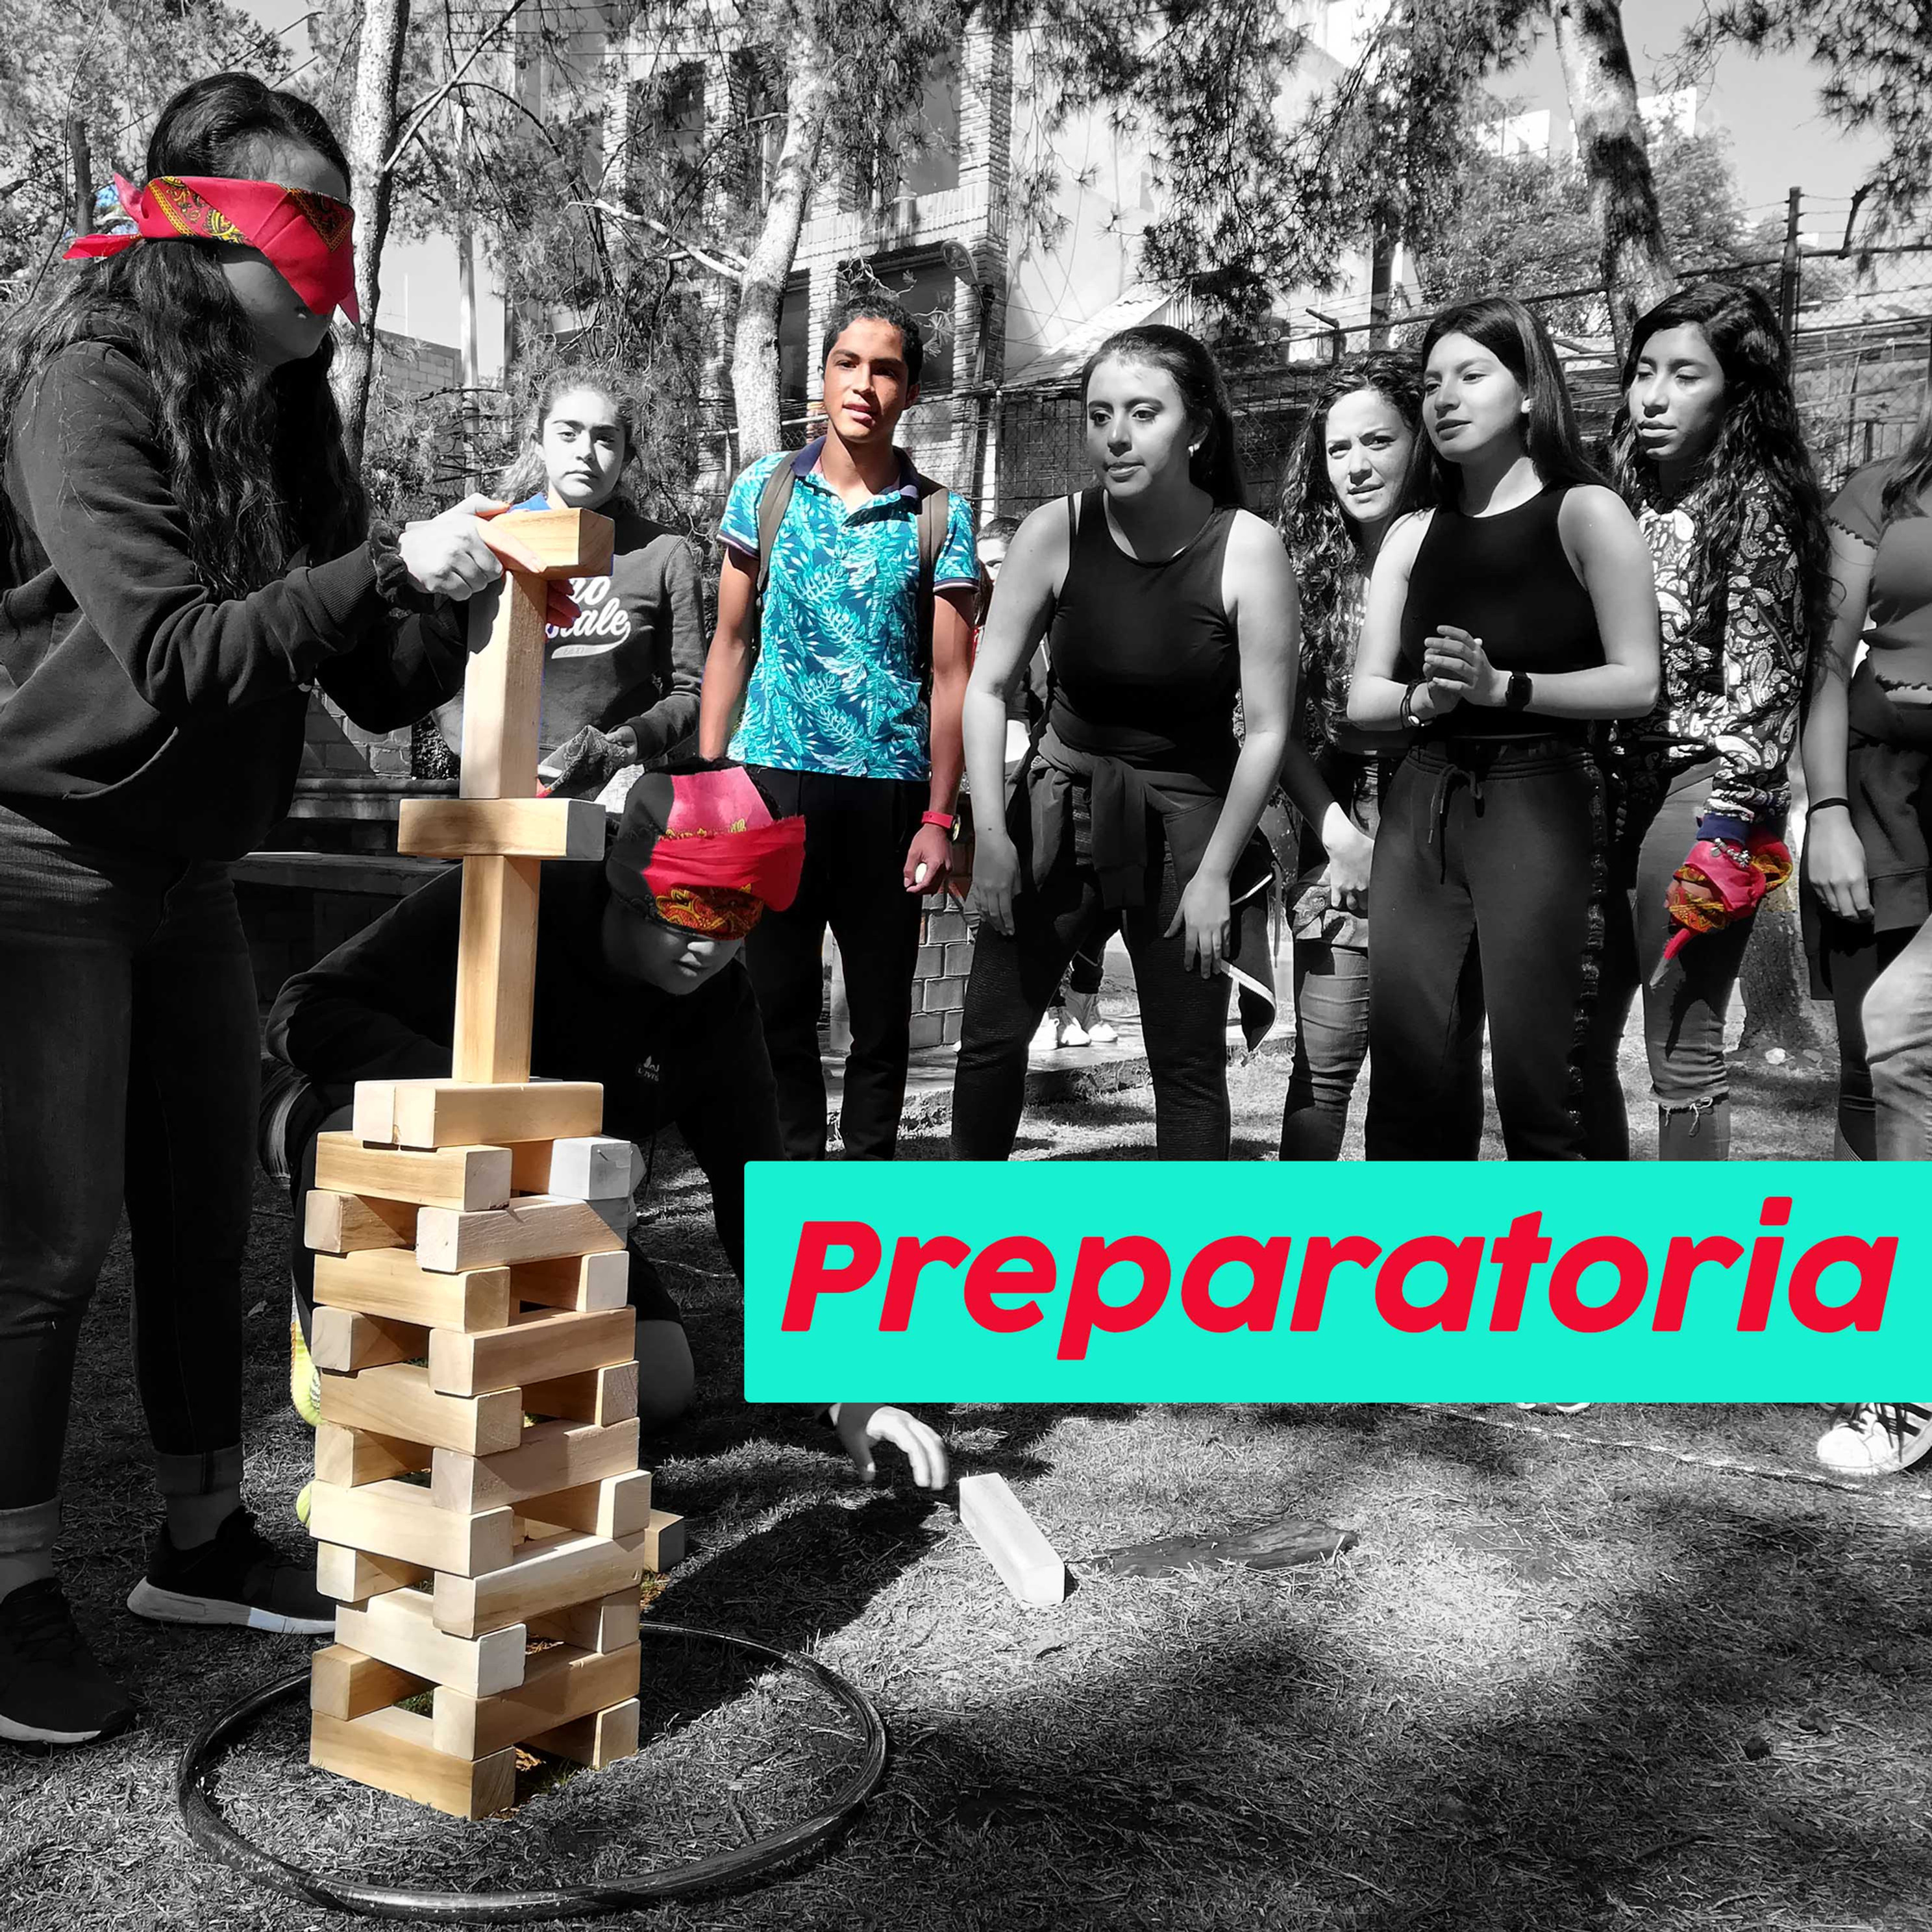 AfterEsCool - Preparatoria